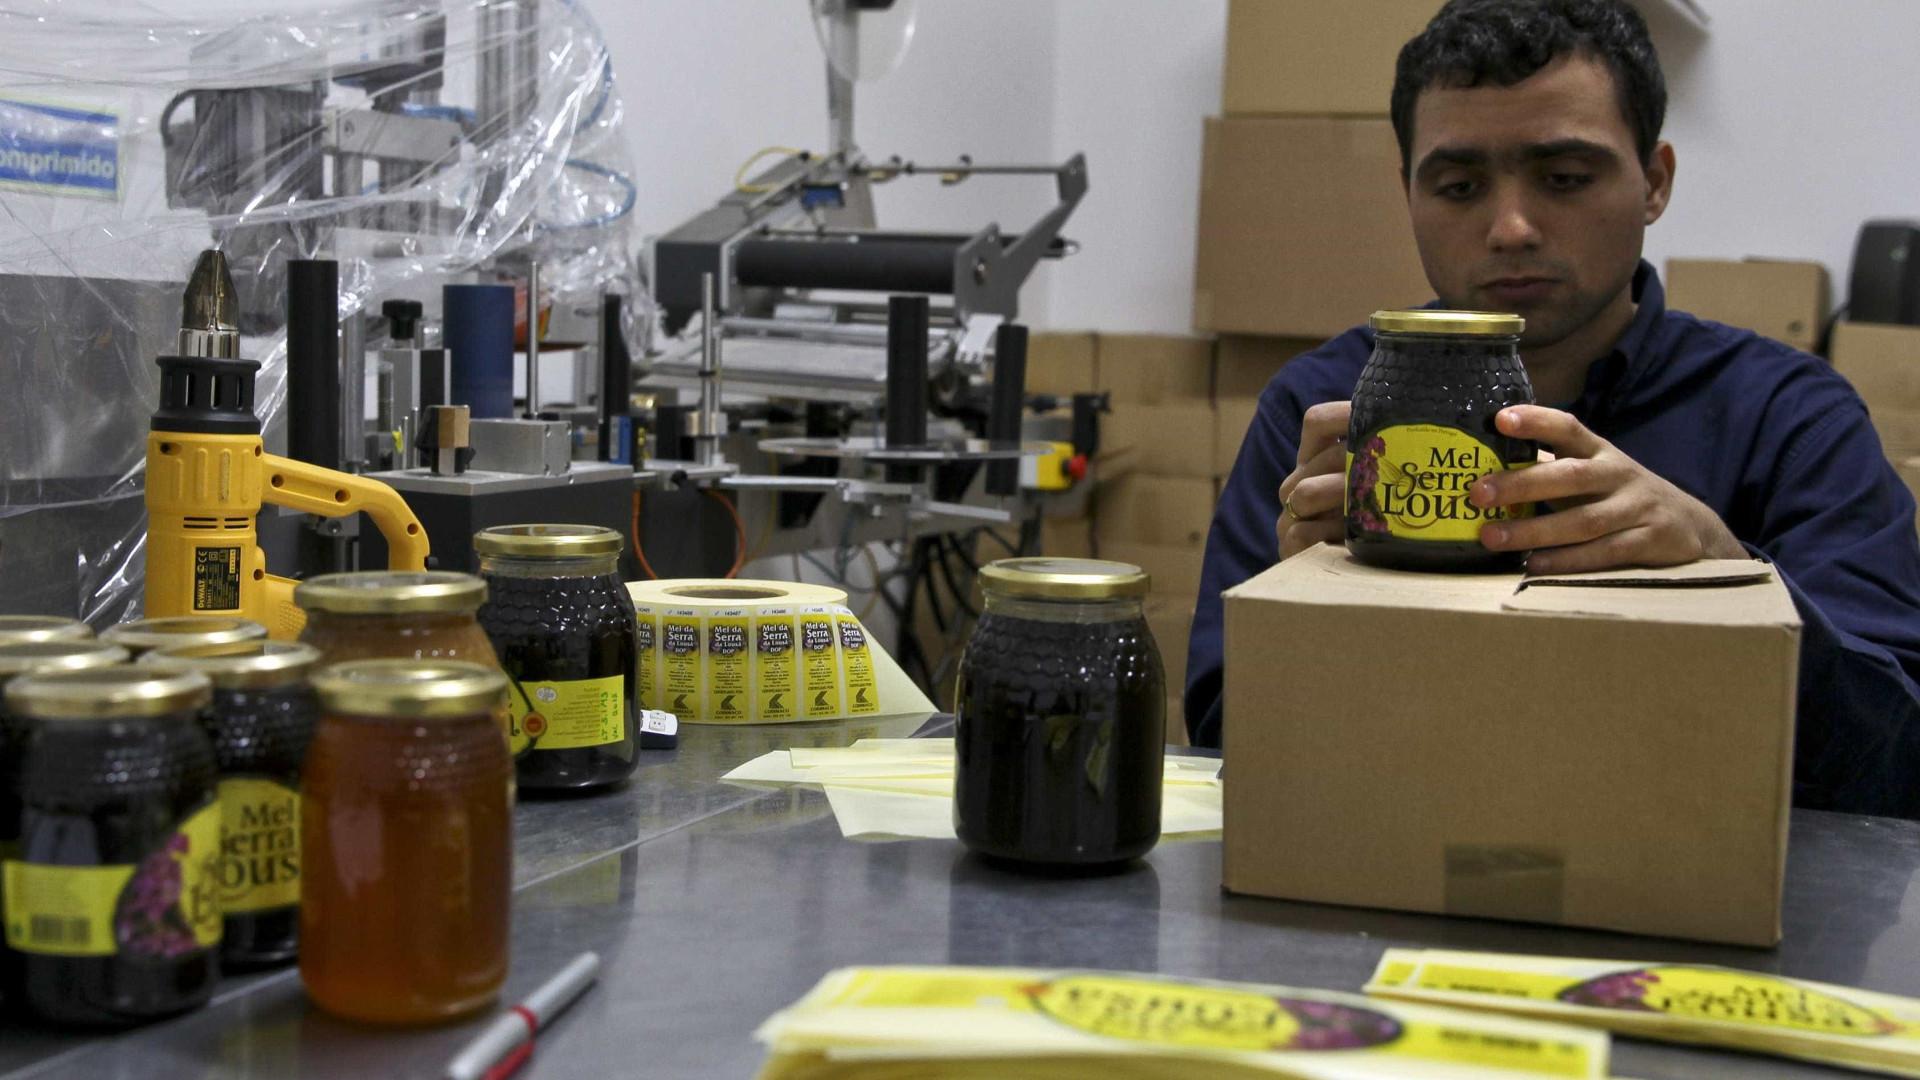 Cooperativa de apicultores celebra 25 anos e exporta mel